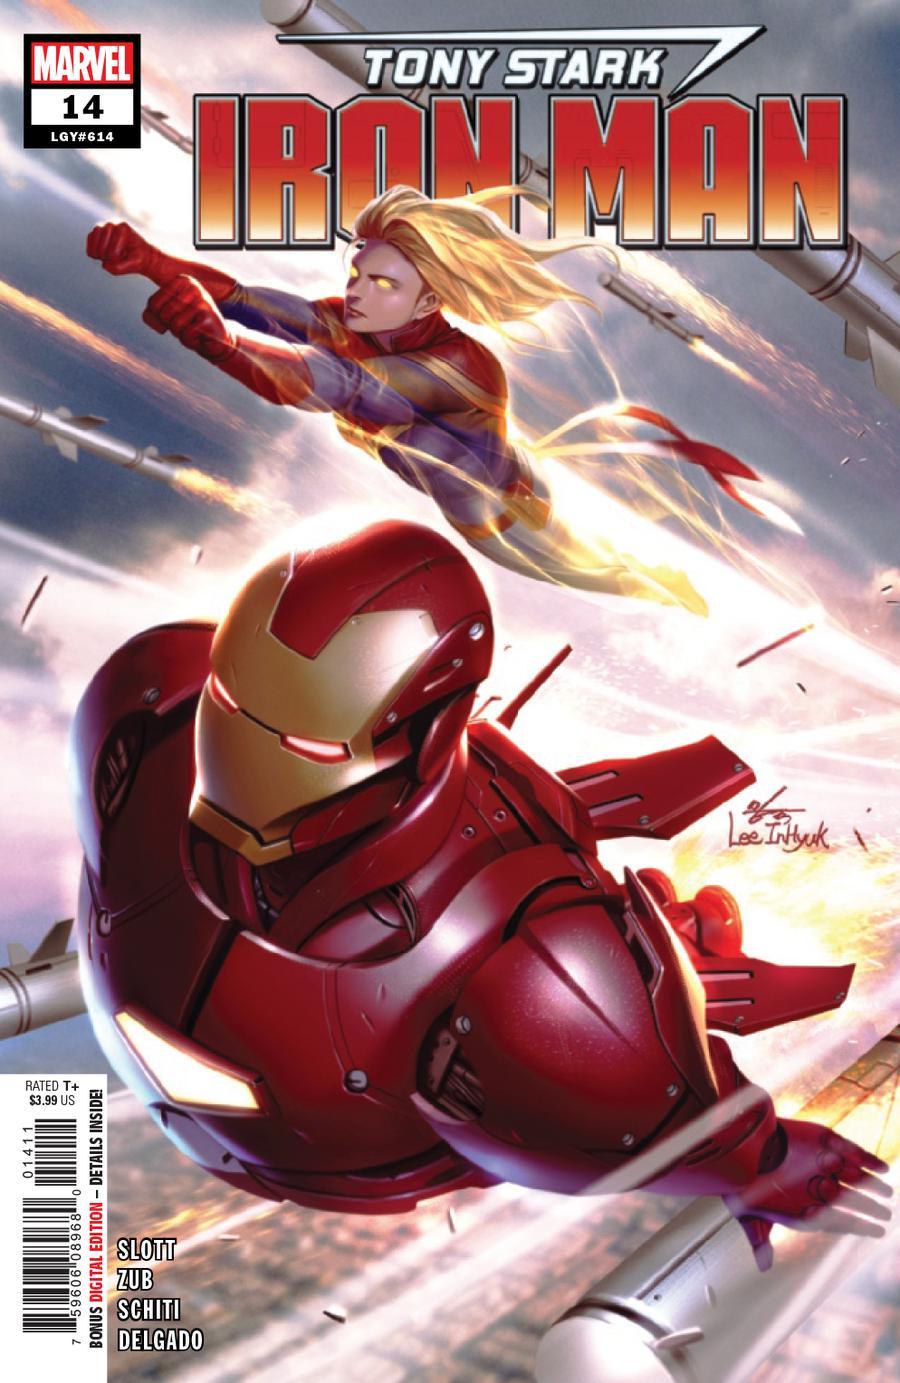 Tony Stark Iron Man #14 Cover A Regular Inhyuk Lee Cover